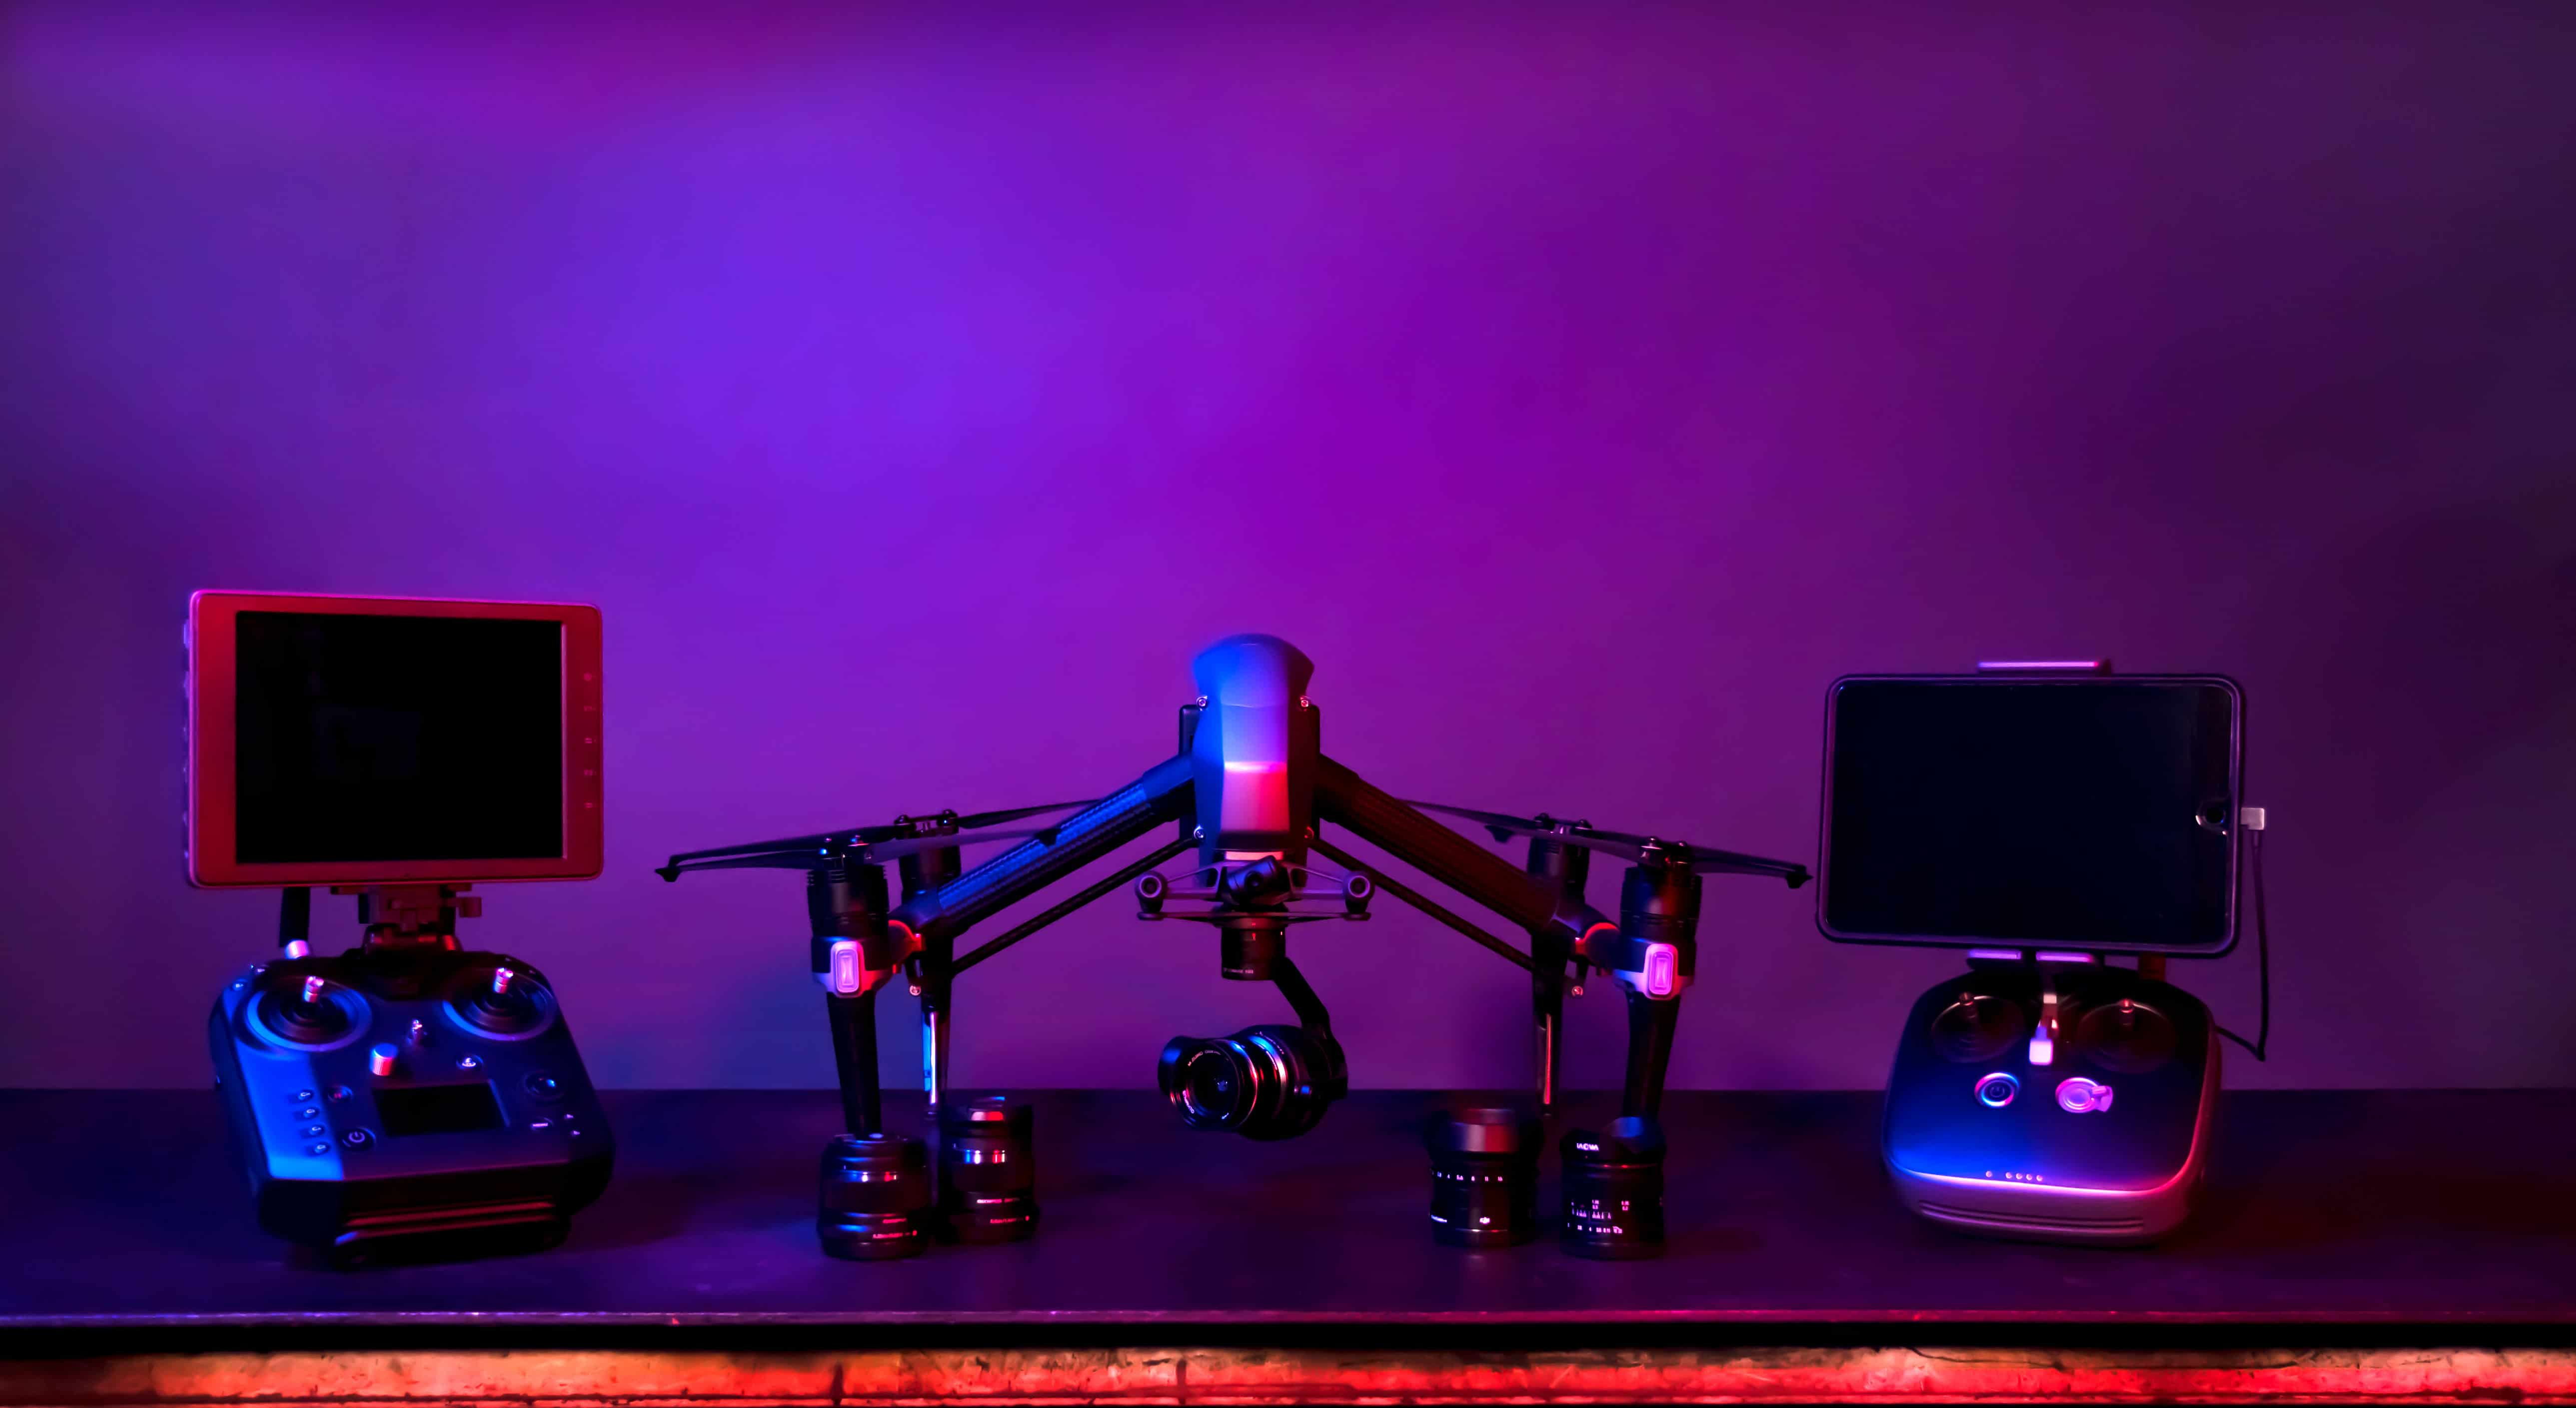 Drone Model Inspire 2